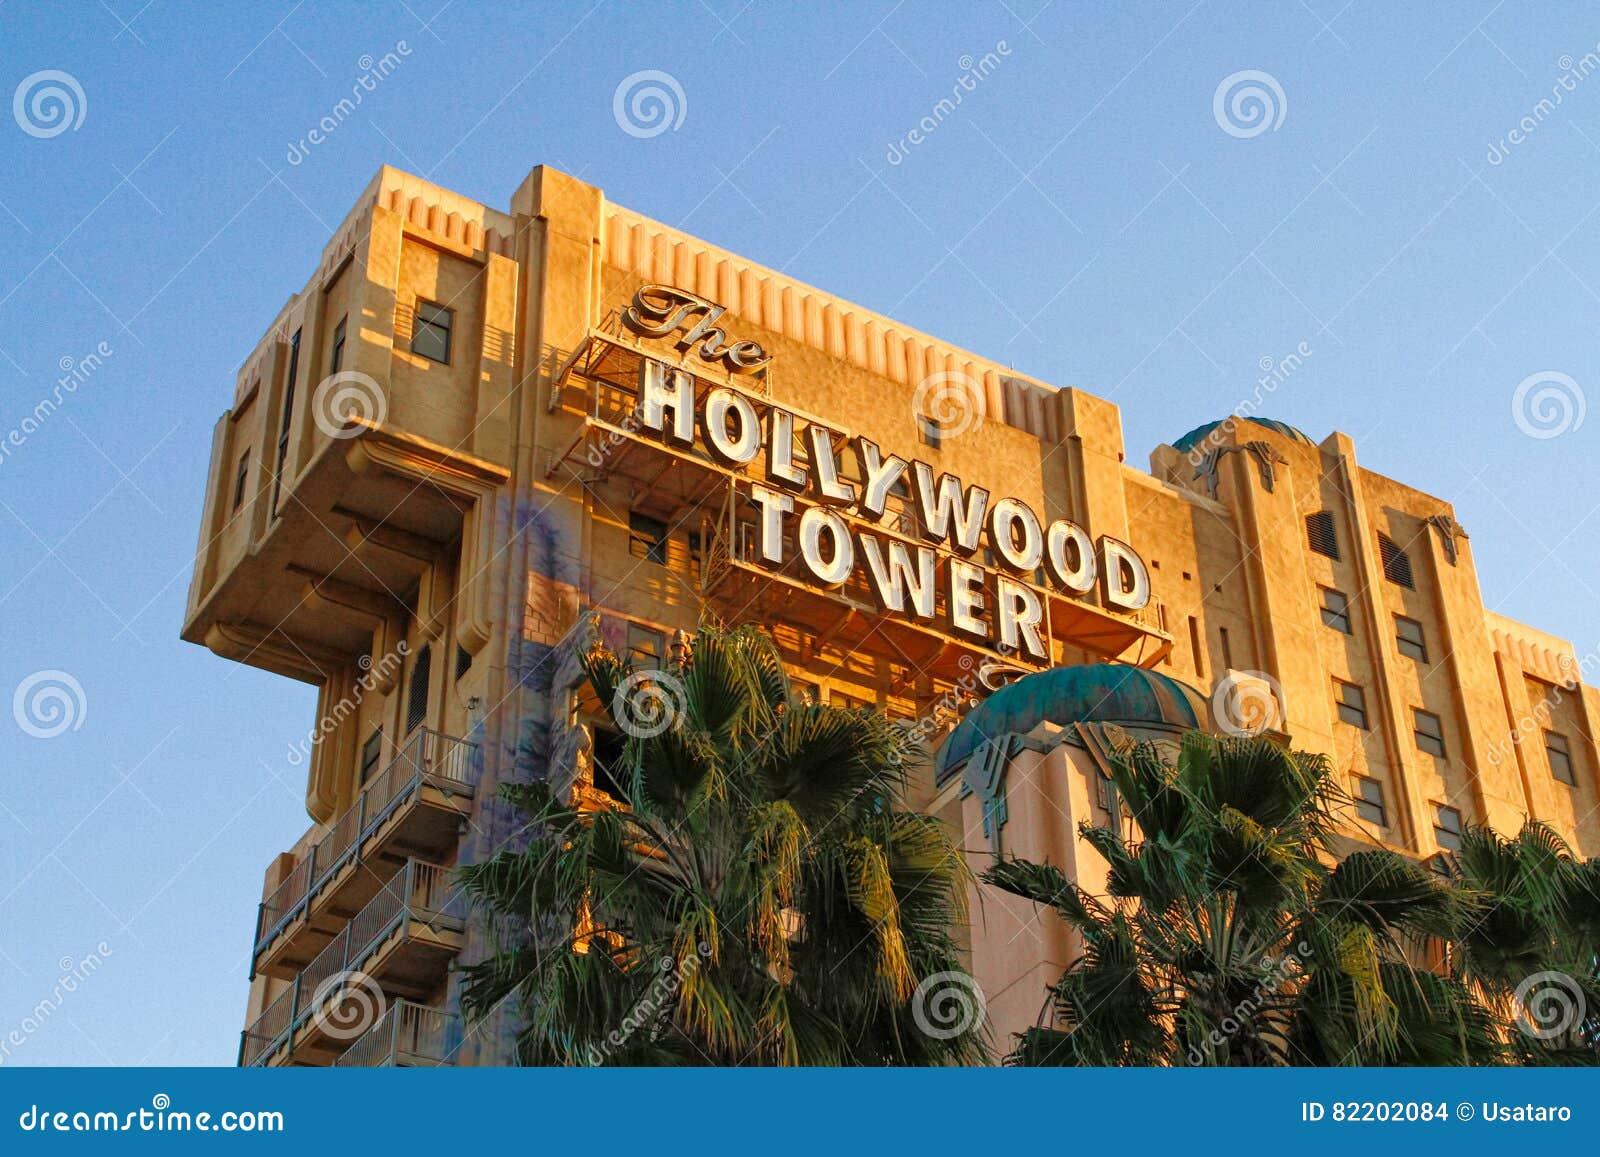 La torre de la zona crepuscular del hotel i de la torre de Hollywood del terror